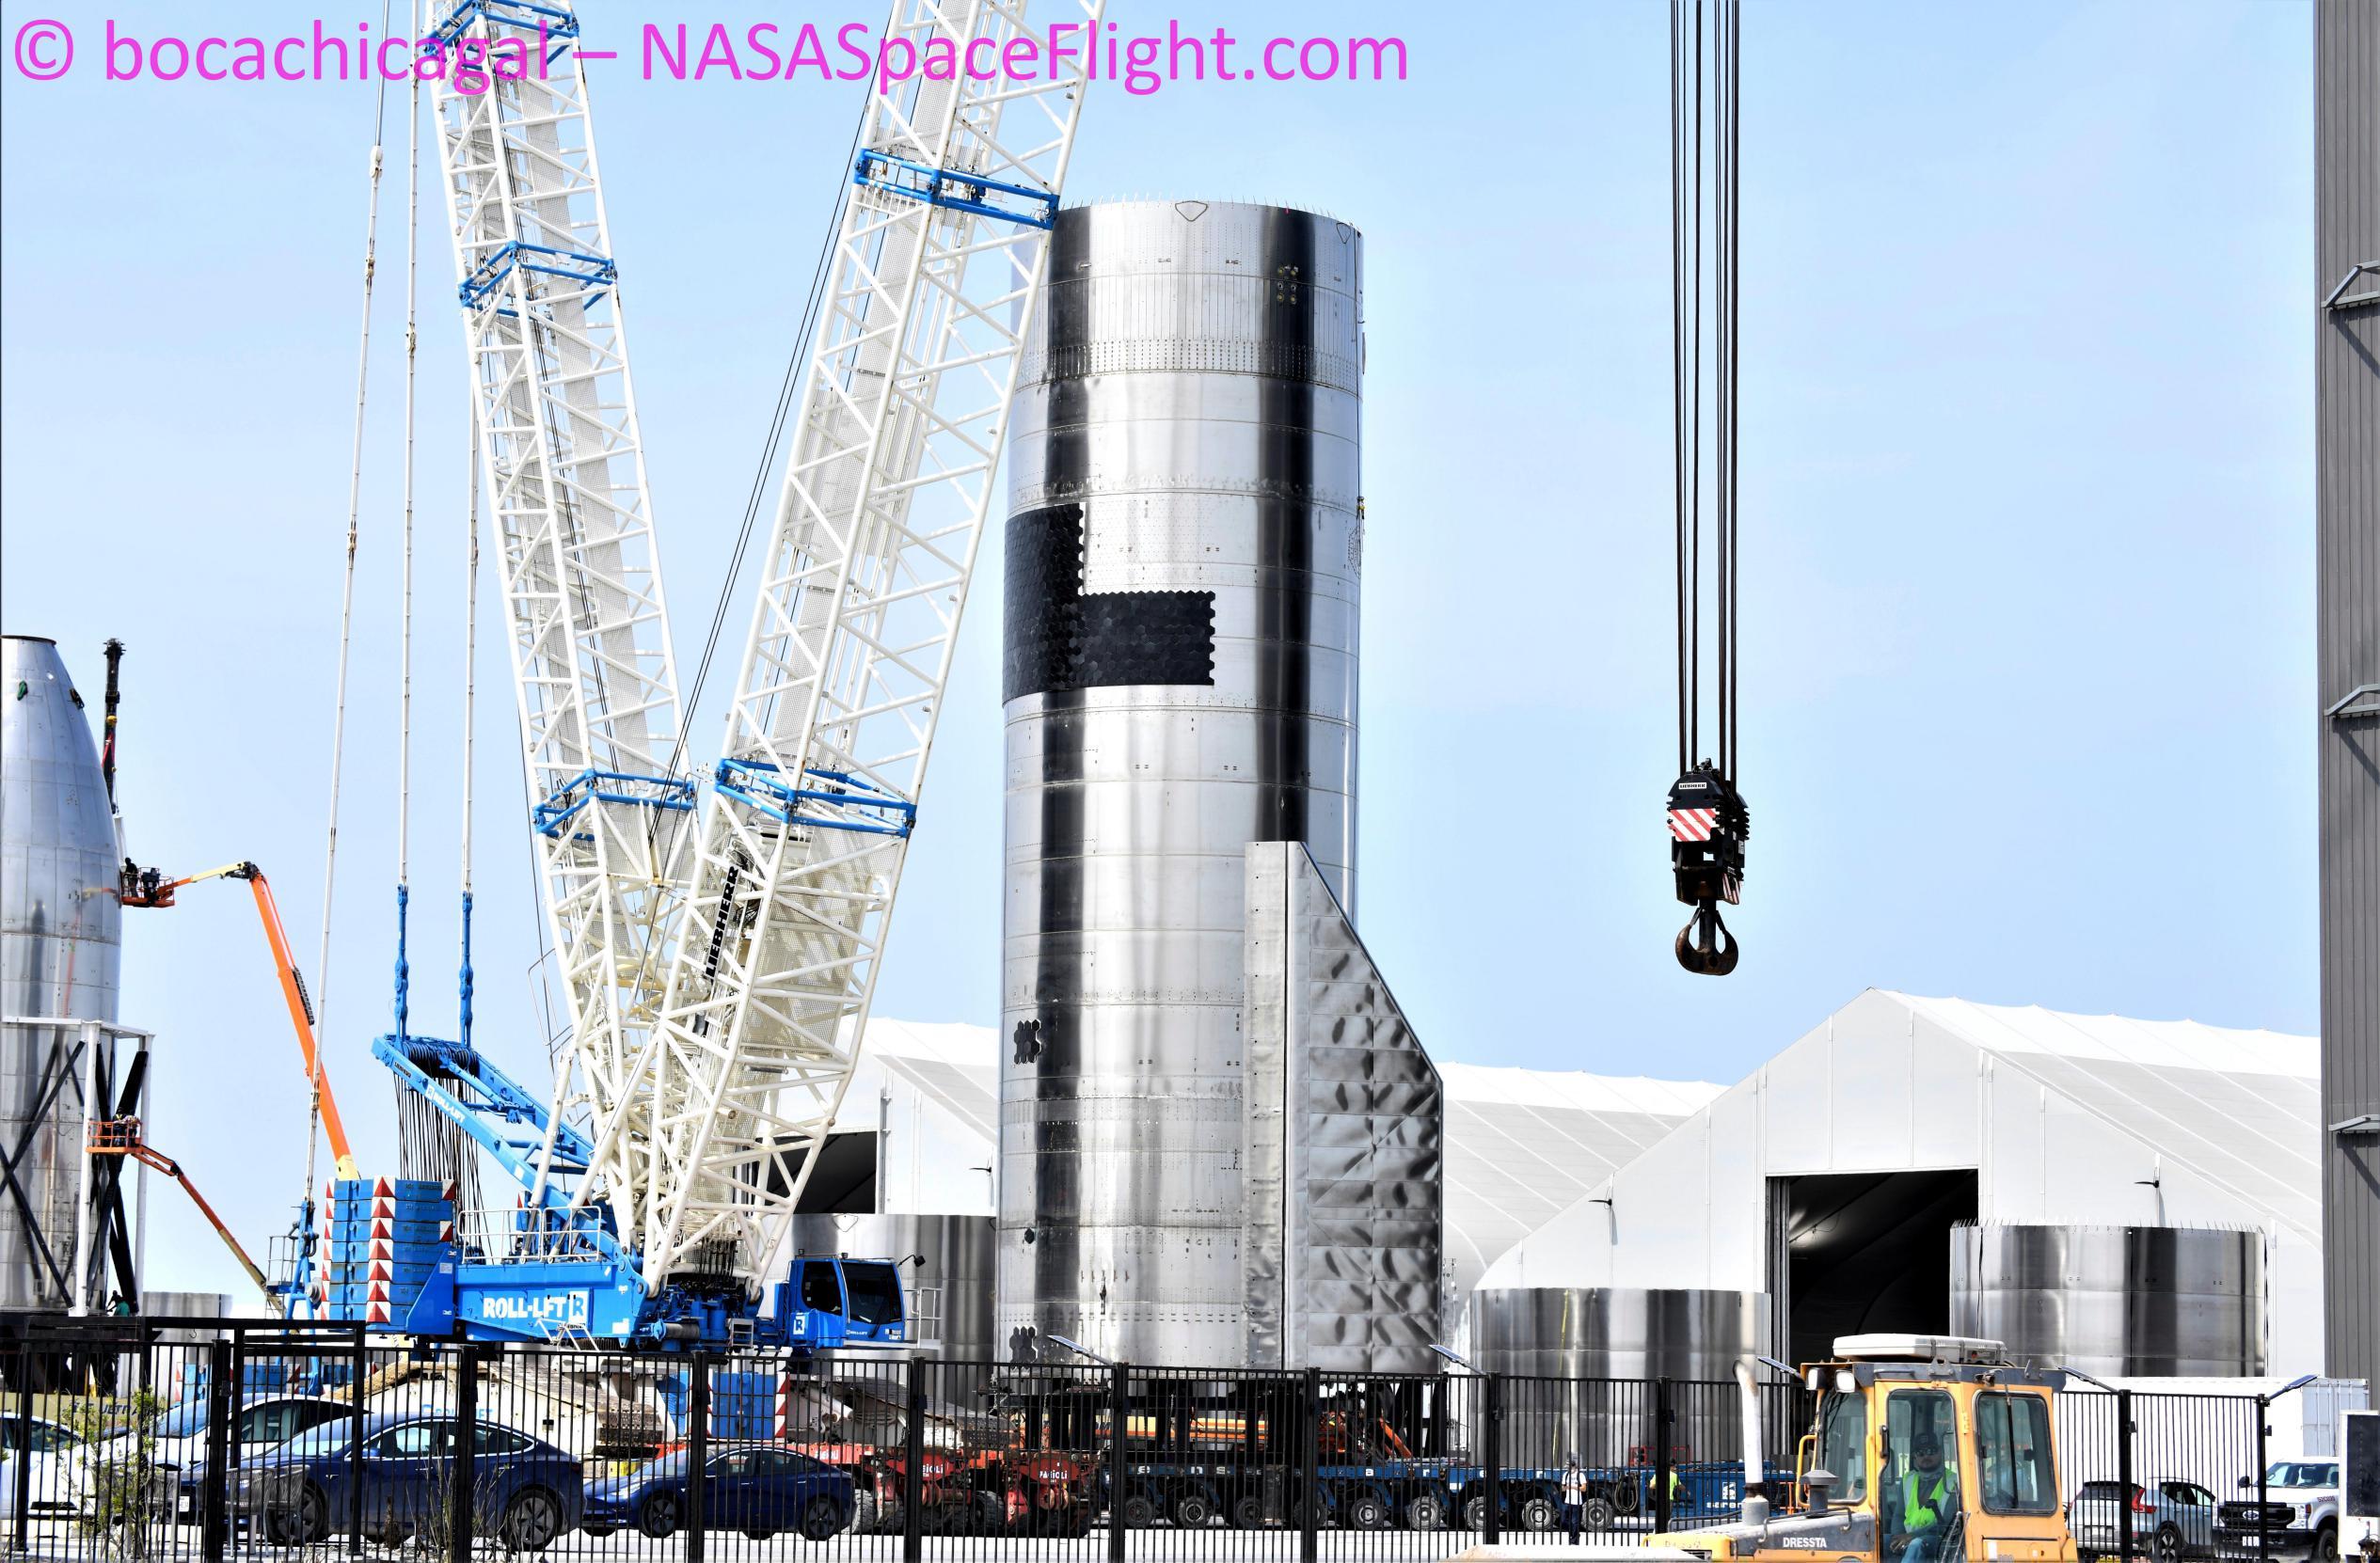 Starship Boca Chica 033121 (NASASpaceflight – bocachicagal) SN15 high bay move 1 (c)